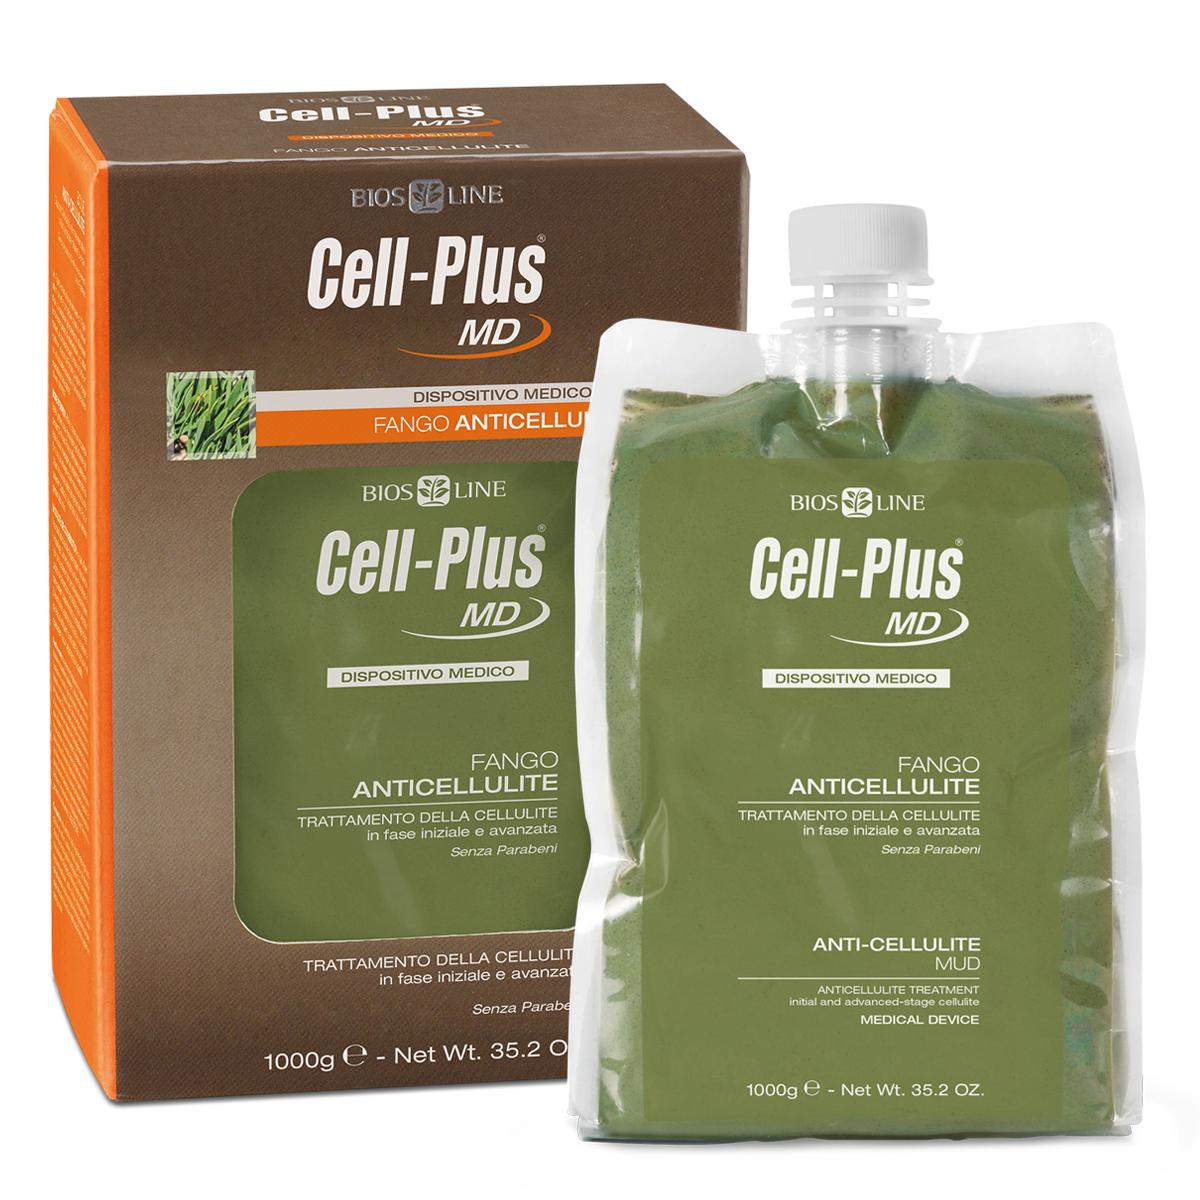 Cell-Plus MD Anticellulite Mud